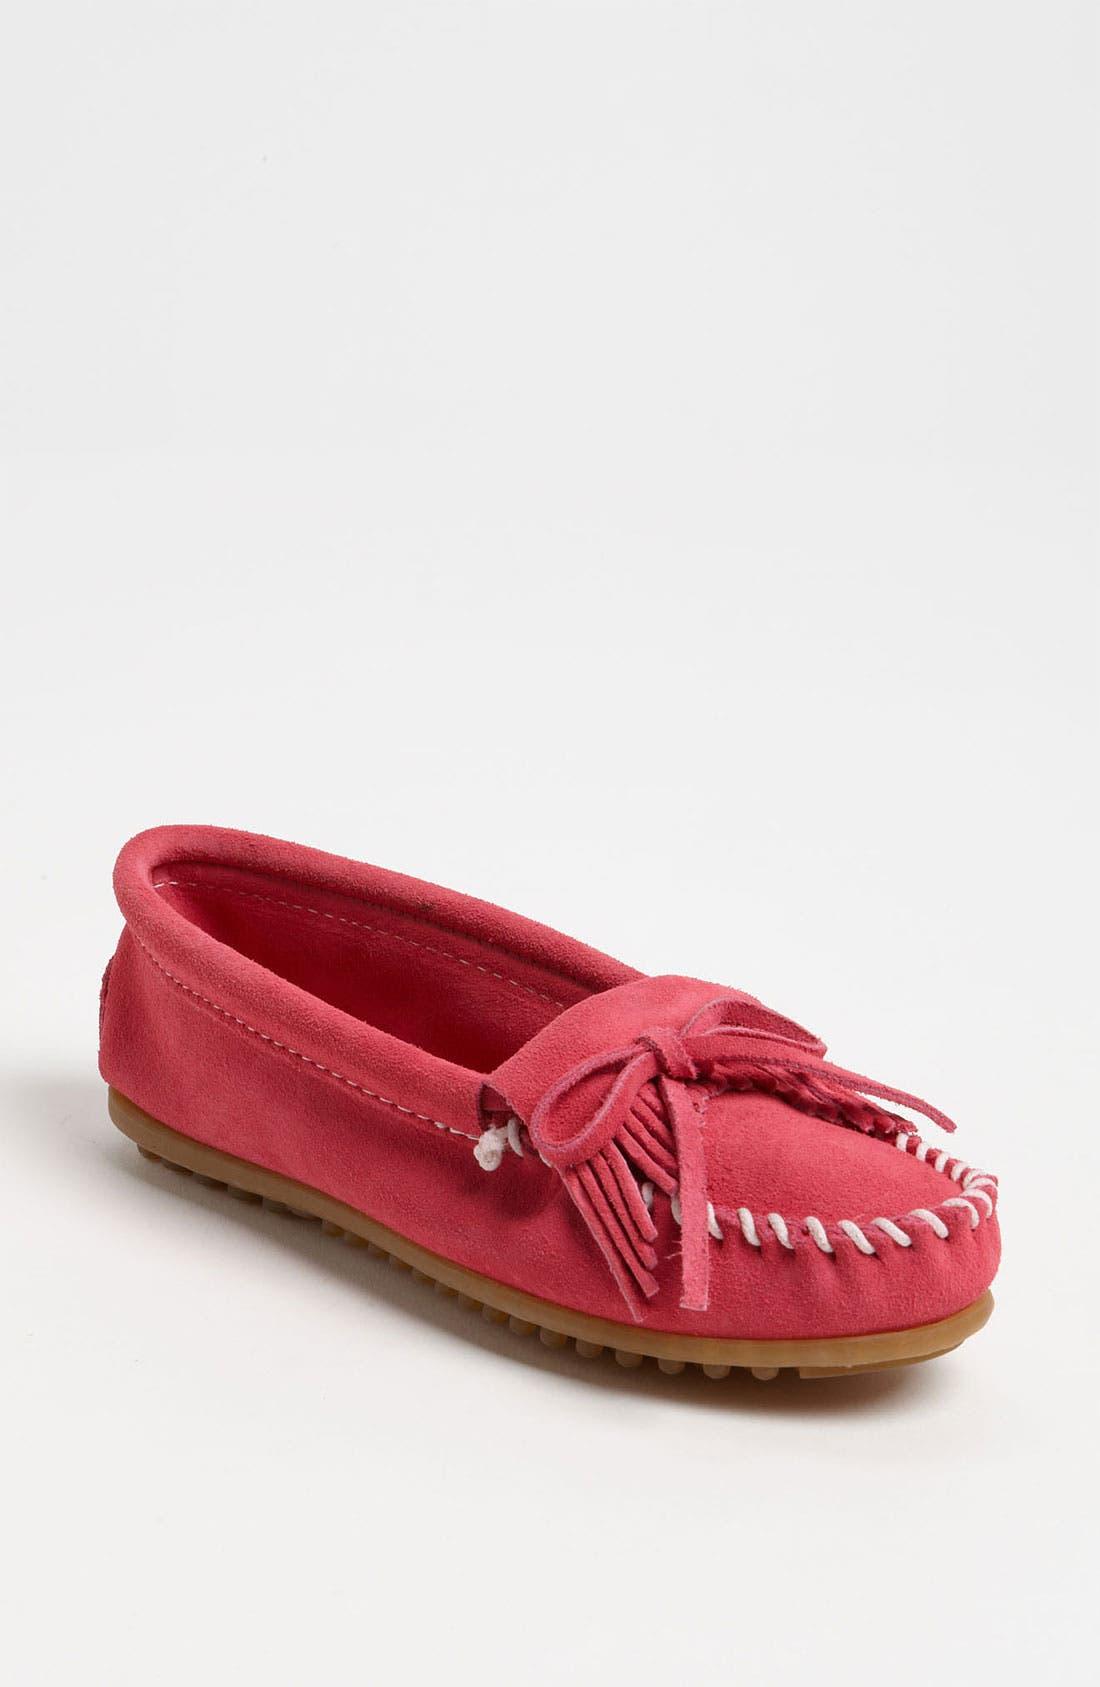 'Kilty' Suede Moccasin,                         Main,                         color, Pink